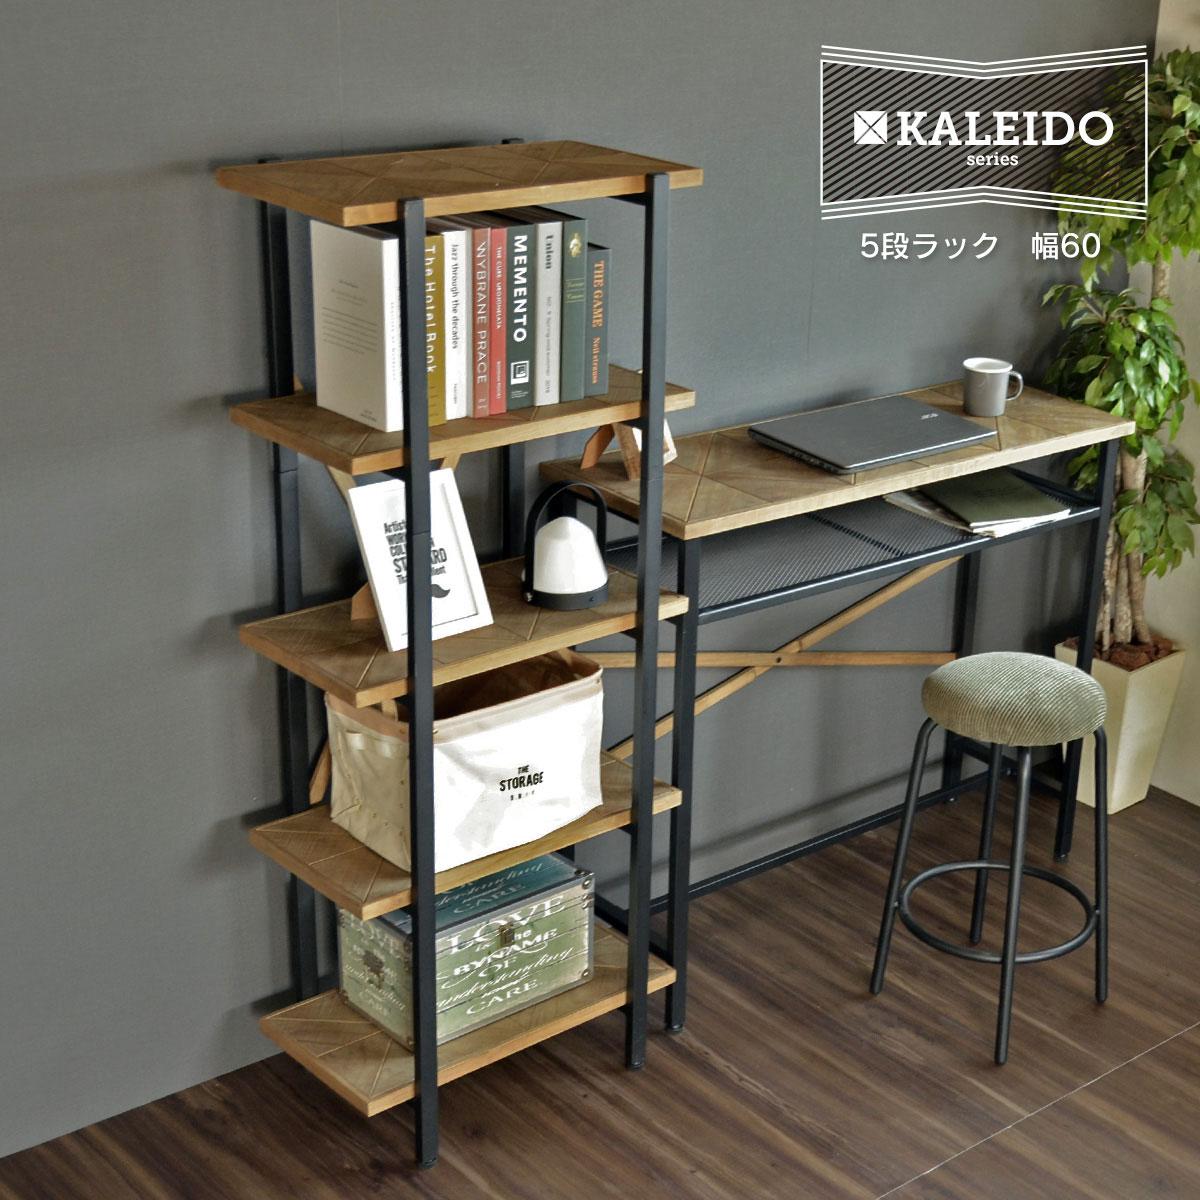 KALEIDO カレイド 5段ラック 幅60cm